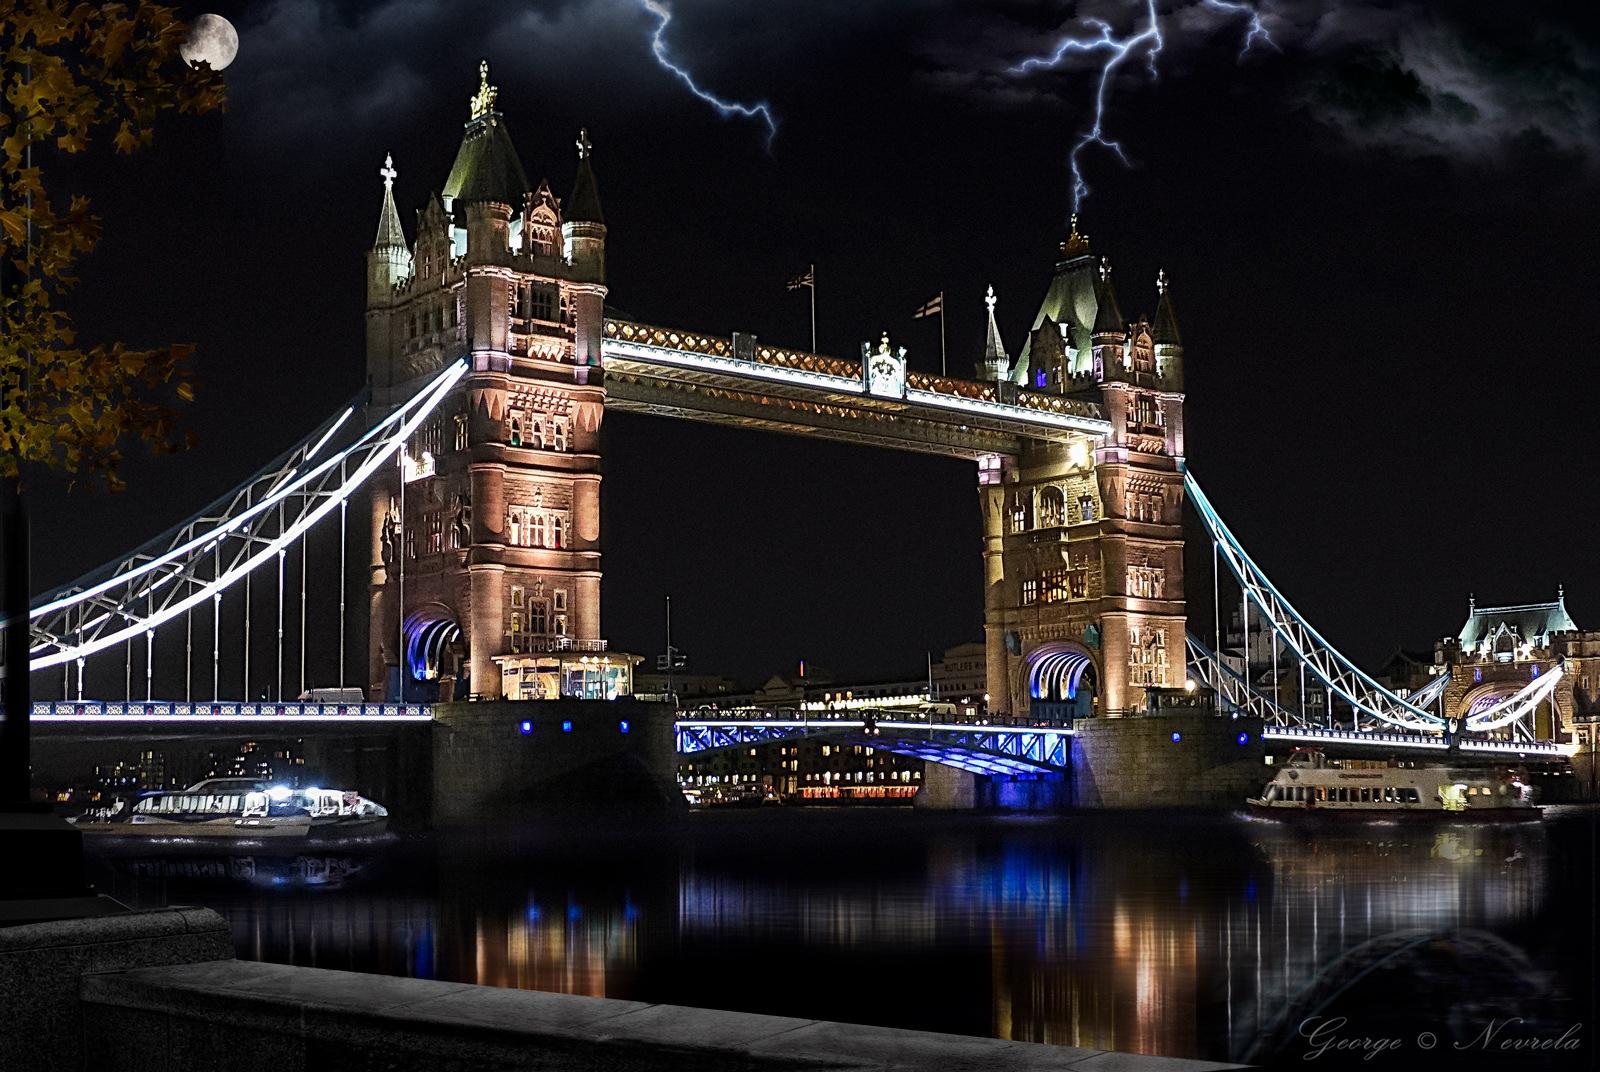 Tower Bridge - London by GeorgeNevrela